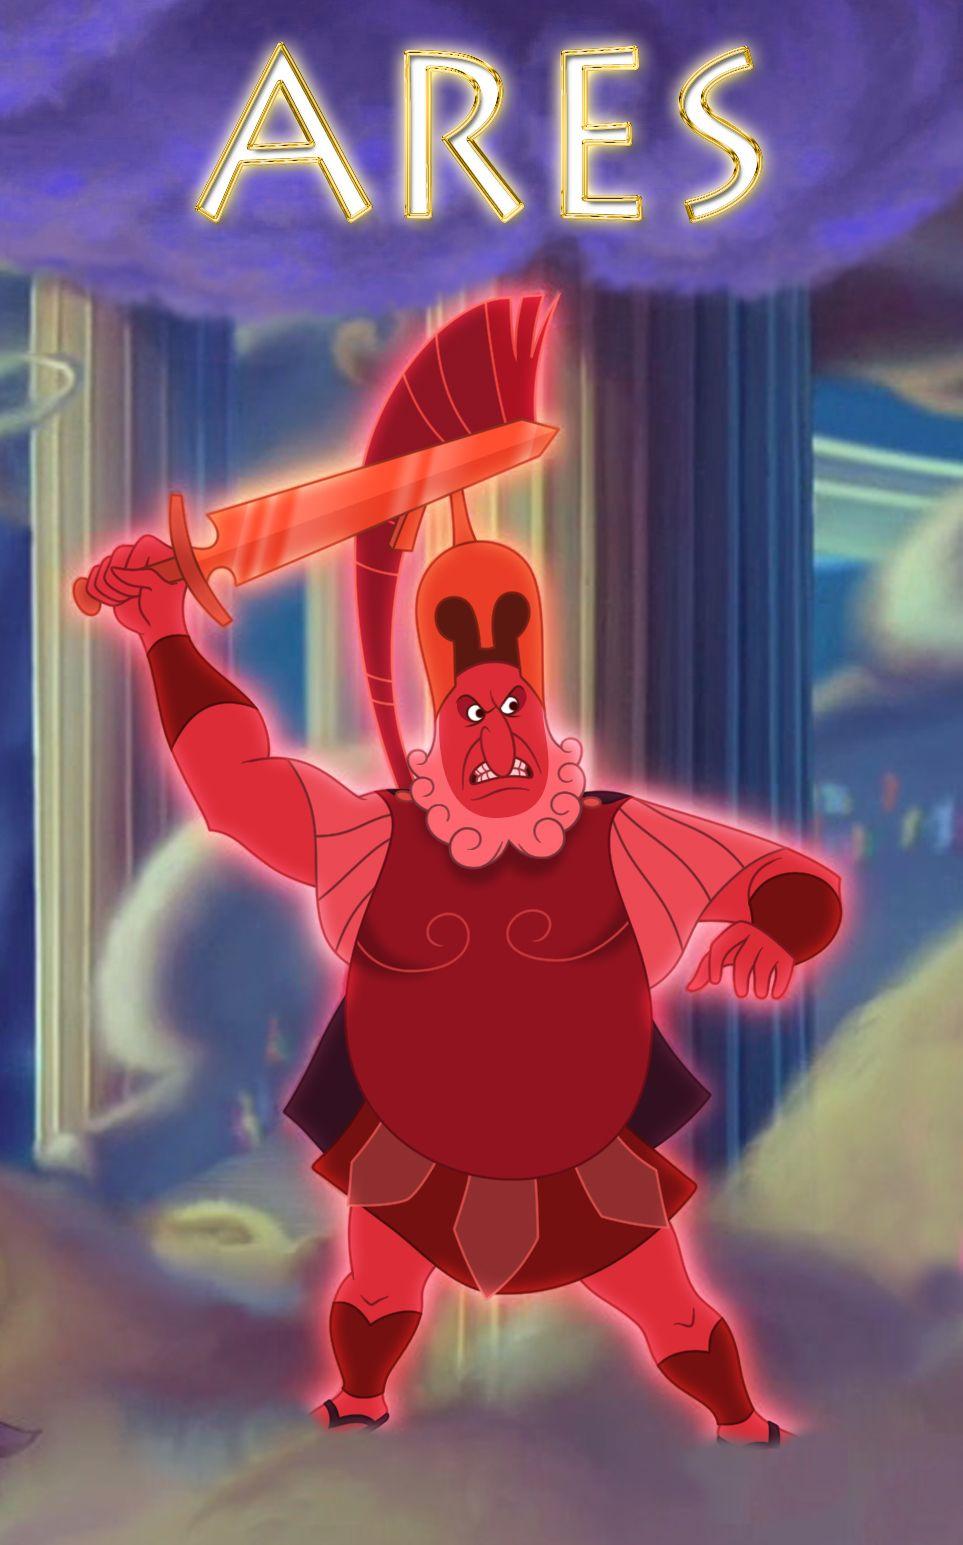 Ares Mars By 666 Lucemon 666 On Deviantart Disney Hercules Zeus And Hera Greek God Of War